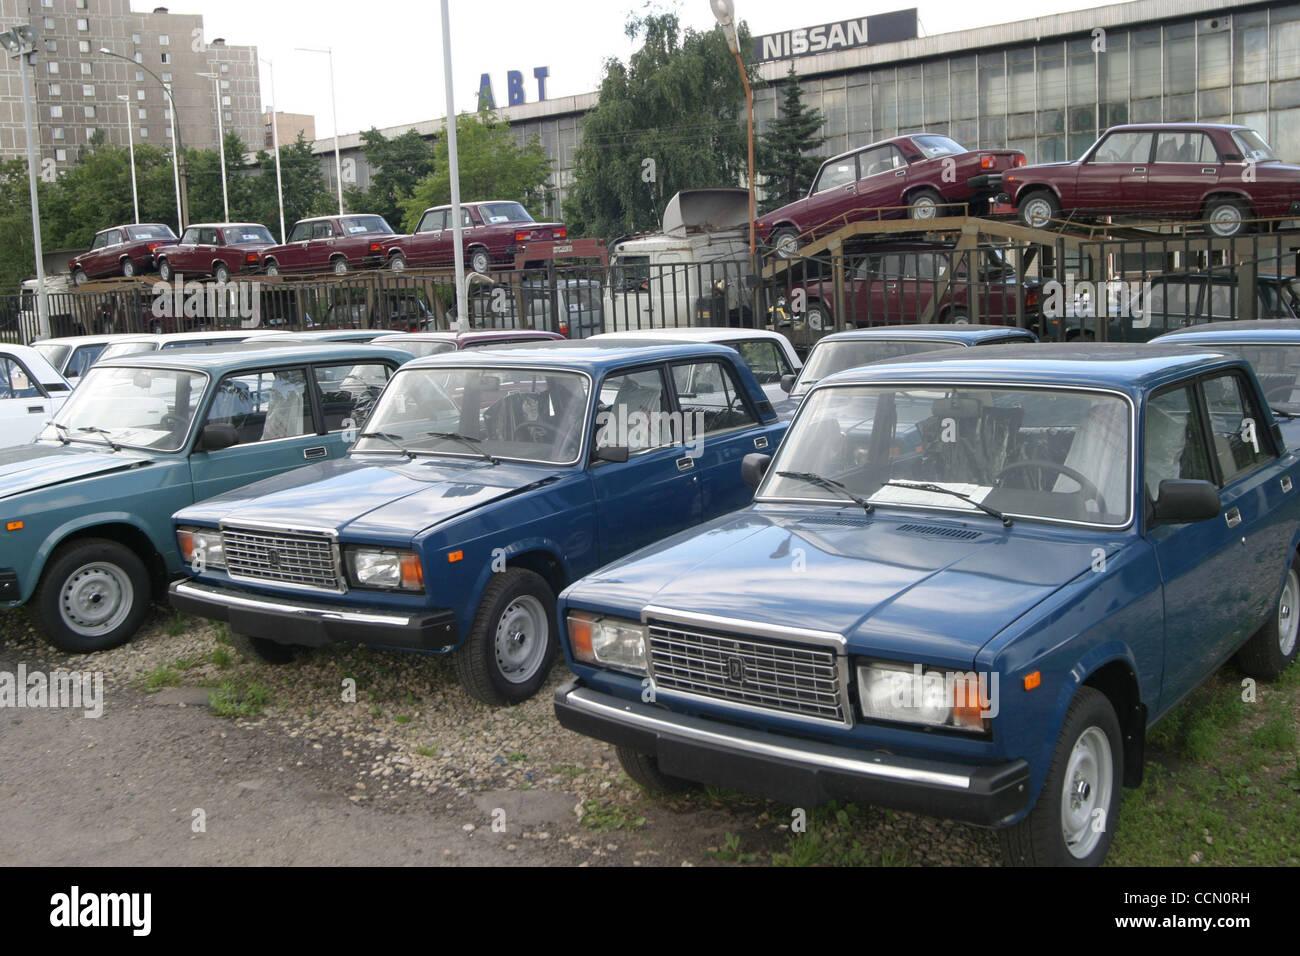 Sale of russian made Lada cars made by Avtovaz car maker Stock Photo ...